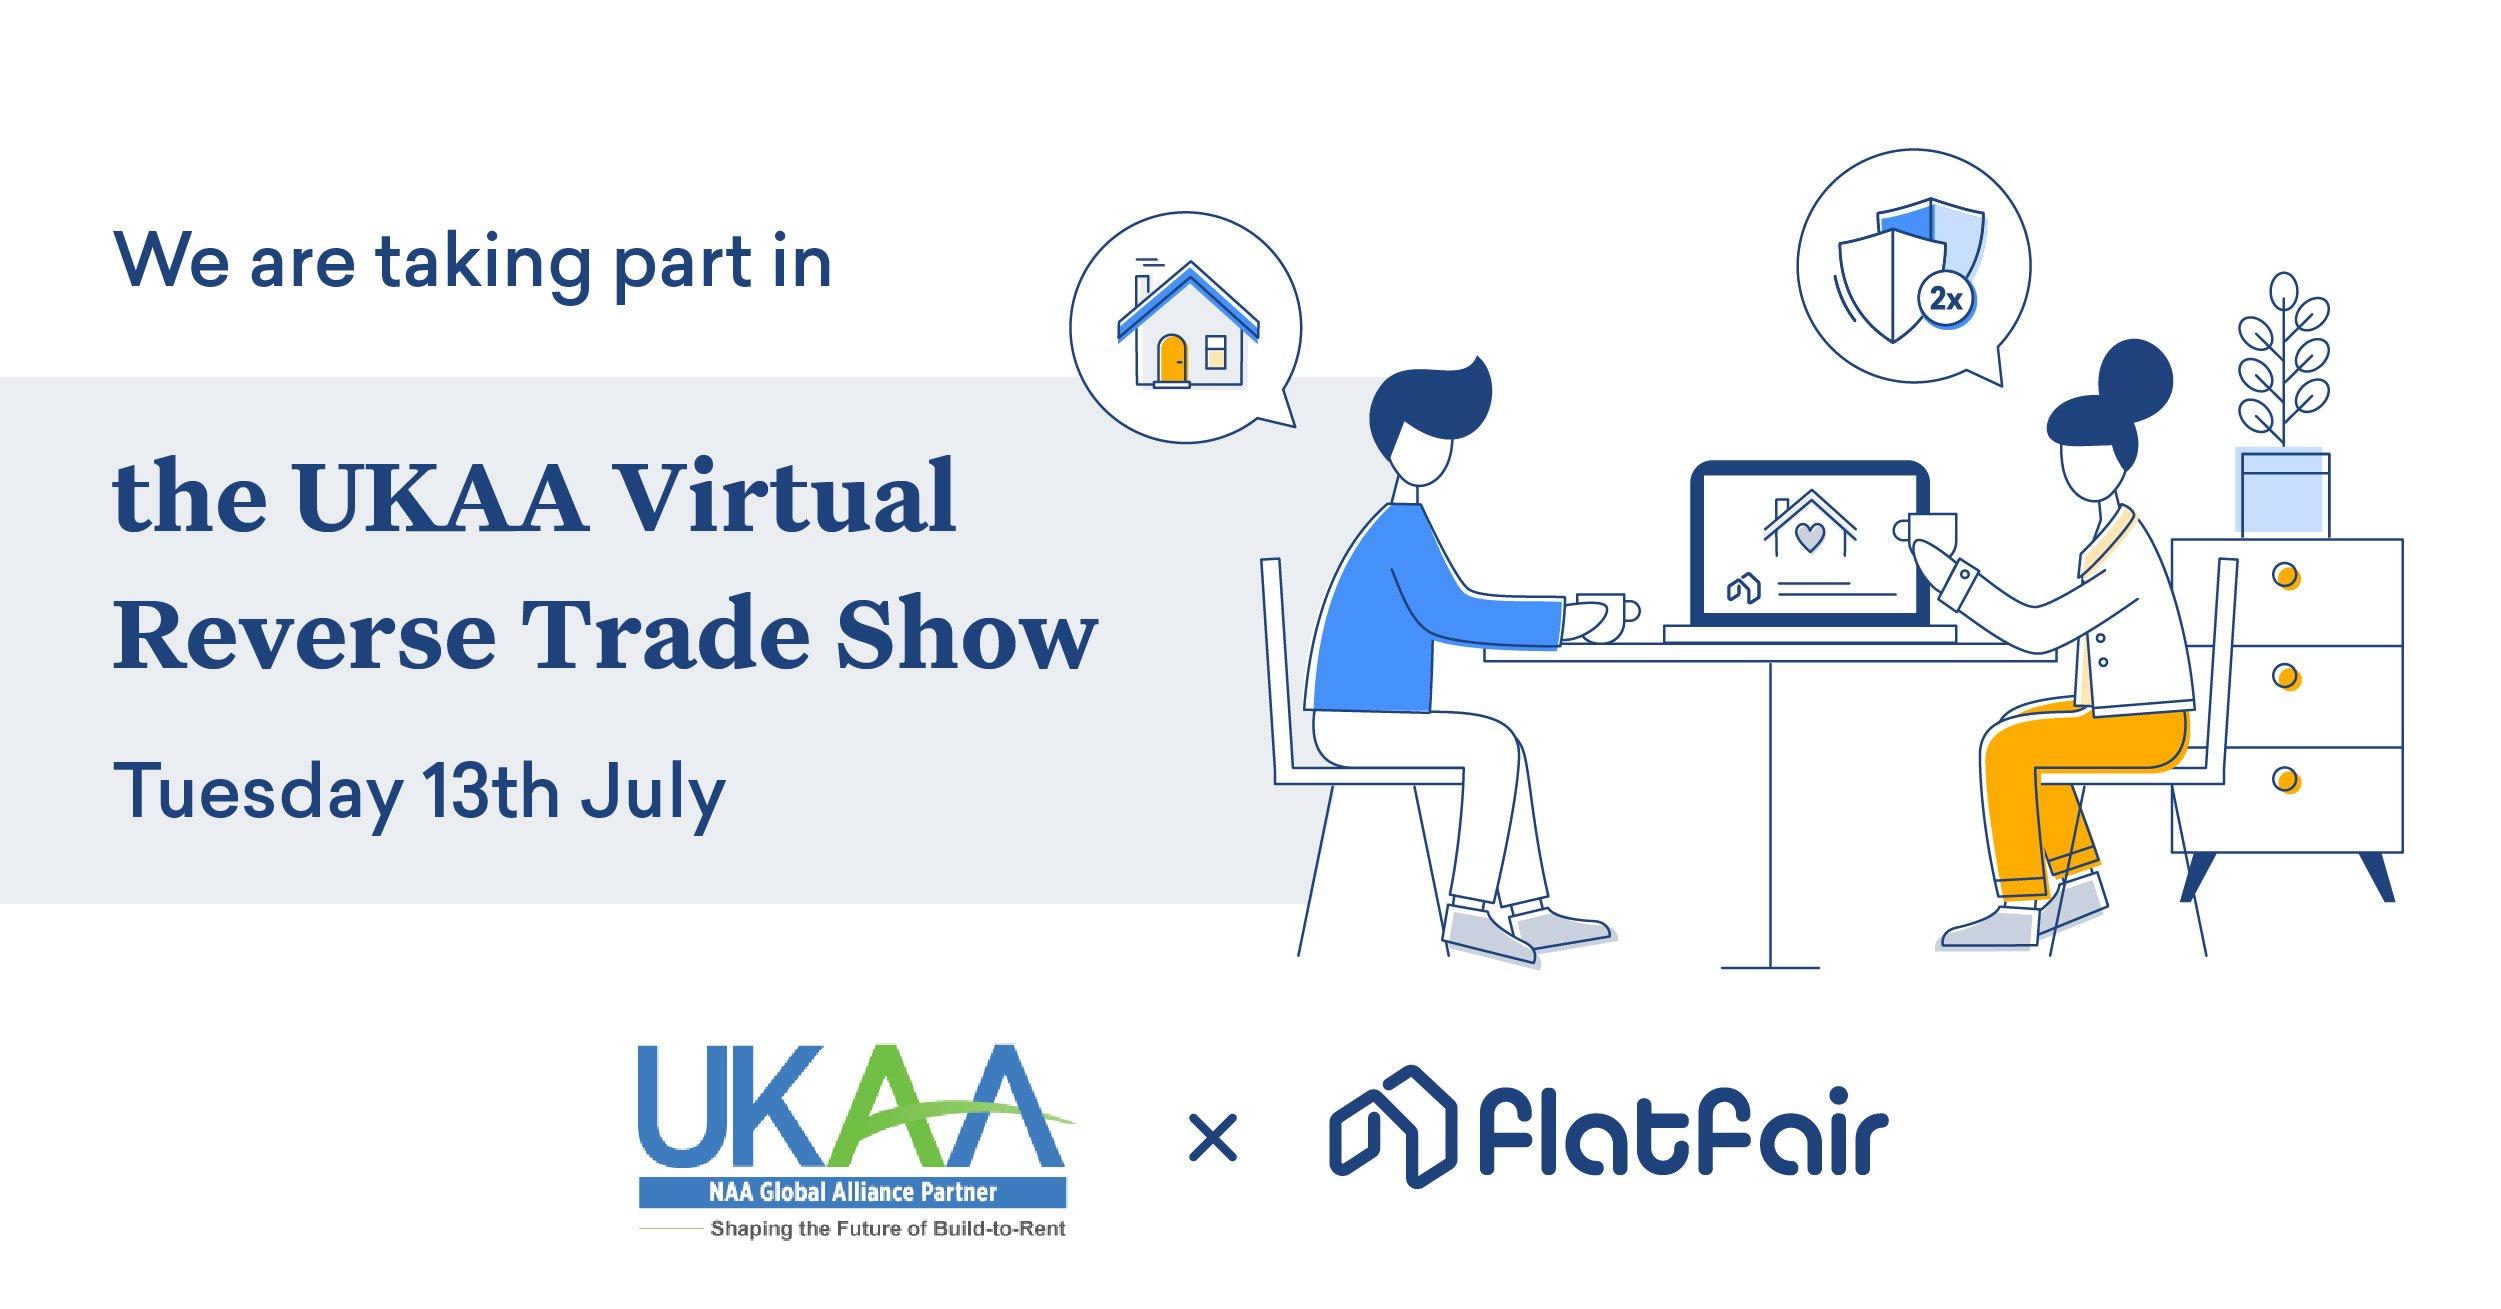 UKAA Reverse Trade Show